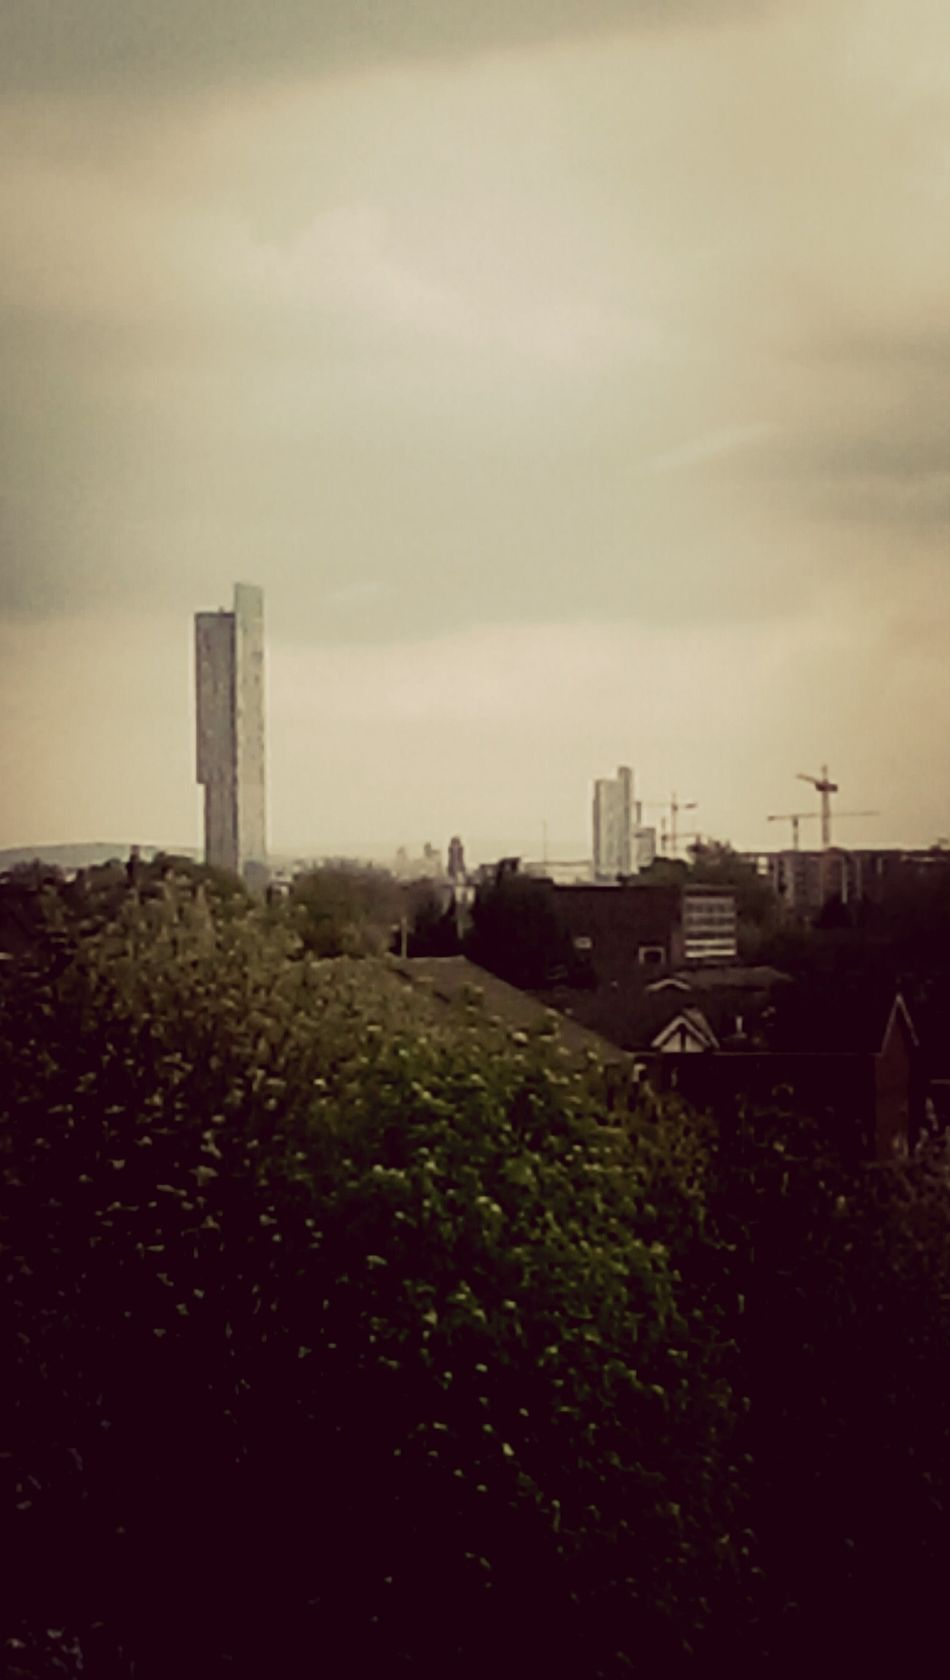 tha Manchester skyline on an overcast Monday evening